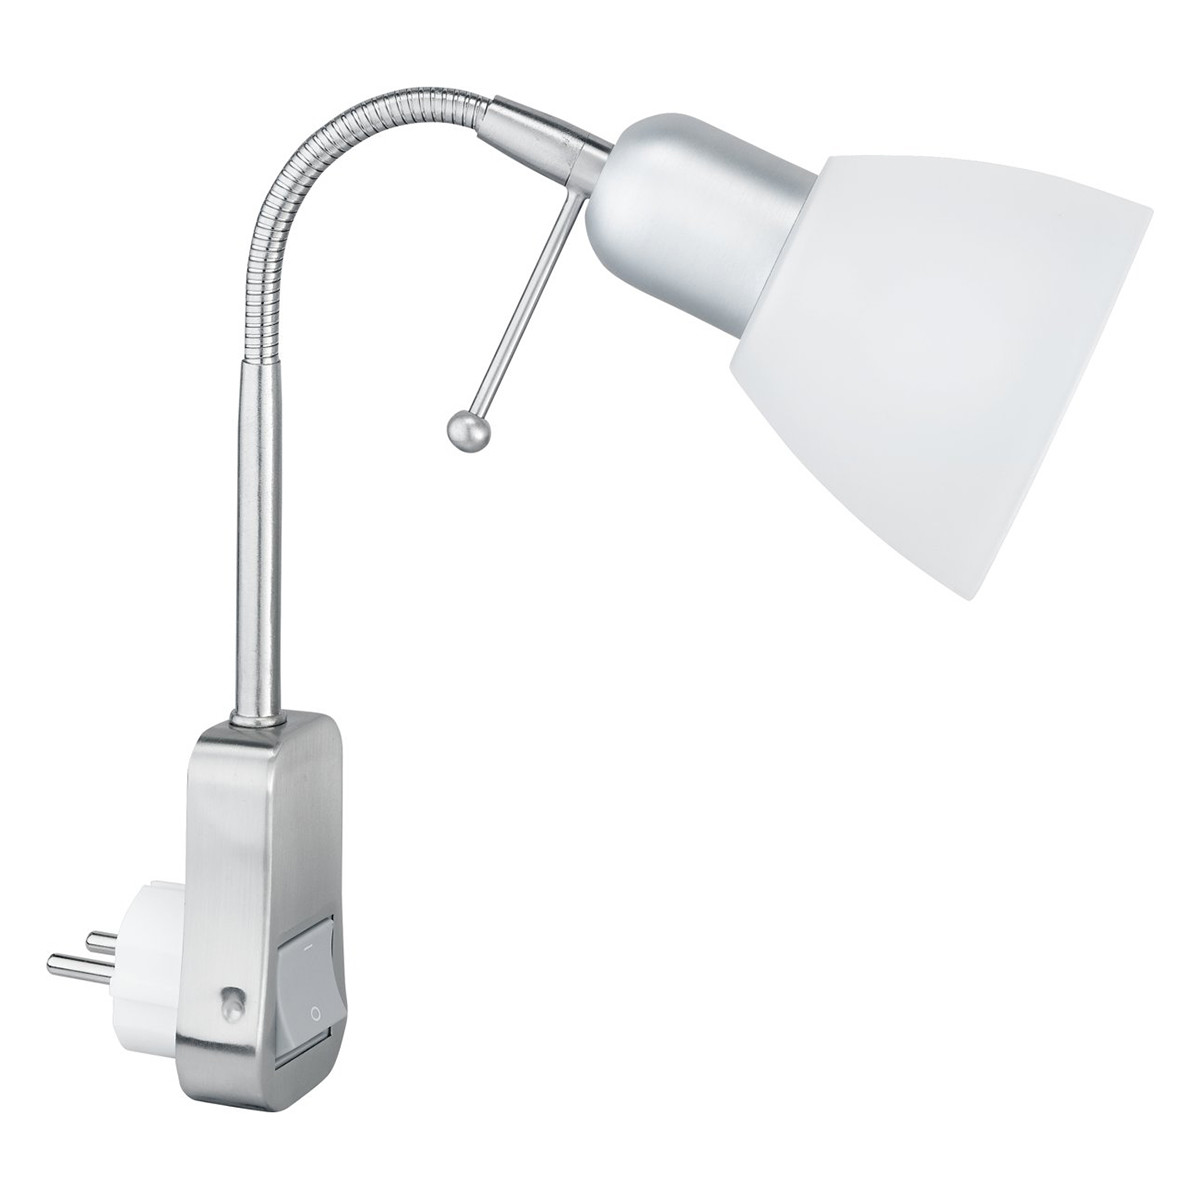 Stopcontact Lamp met Schakelaar - Trion - Rond - Mat Chroom - Aluminium - E14 - Stekkerlamp - Stekke